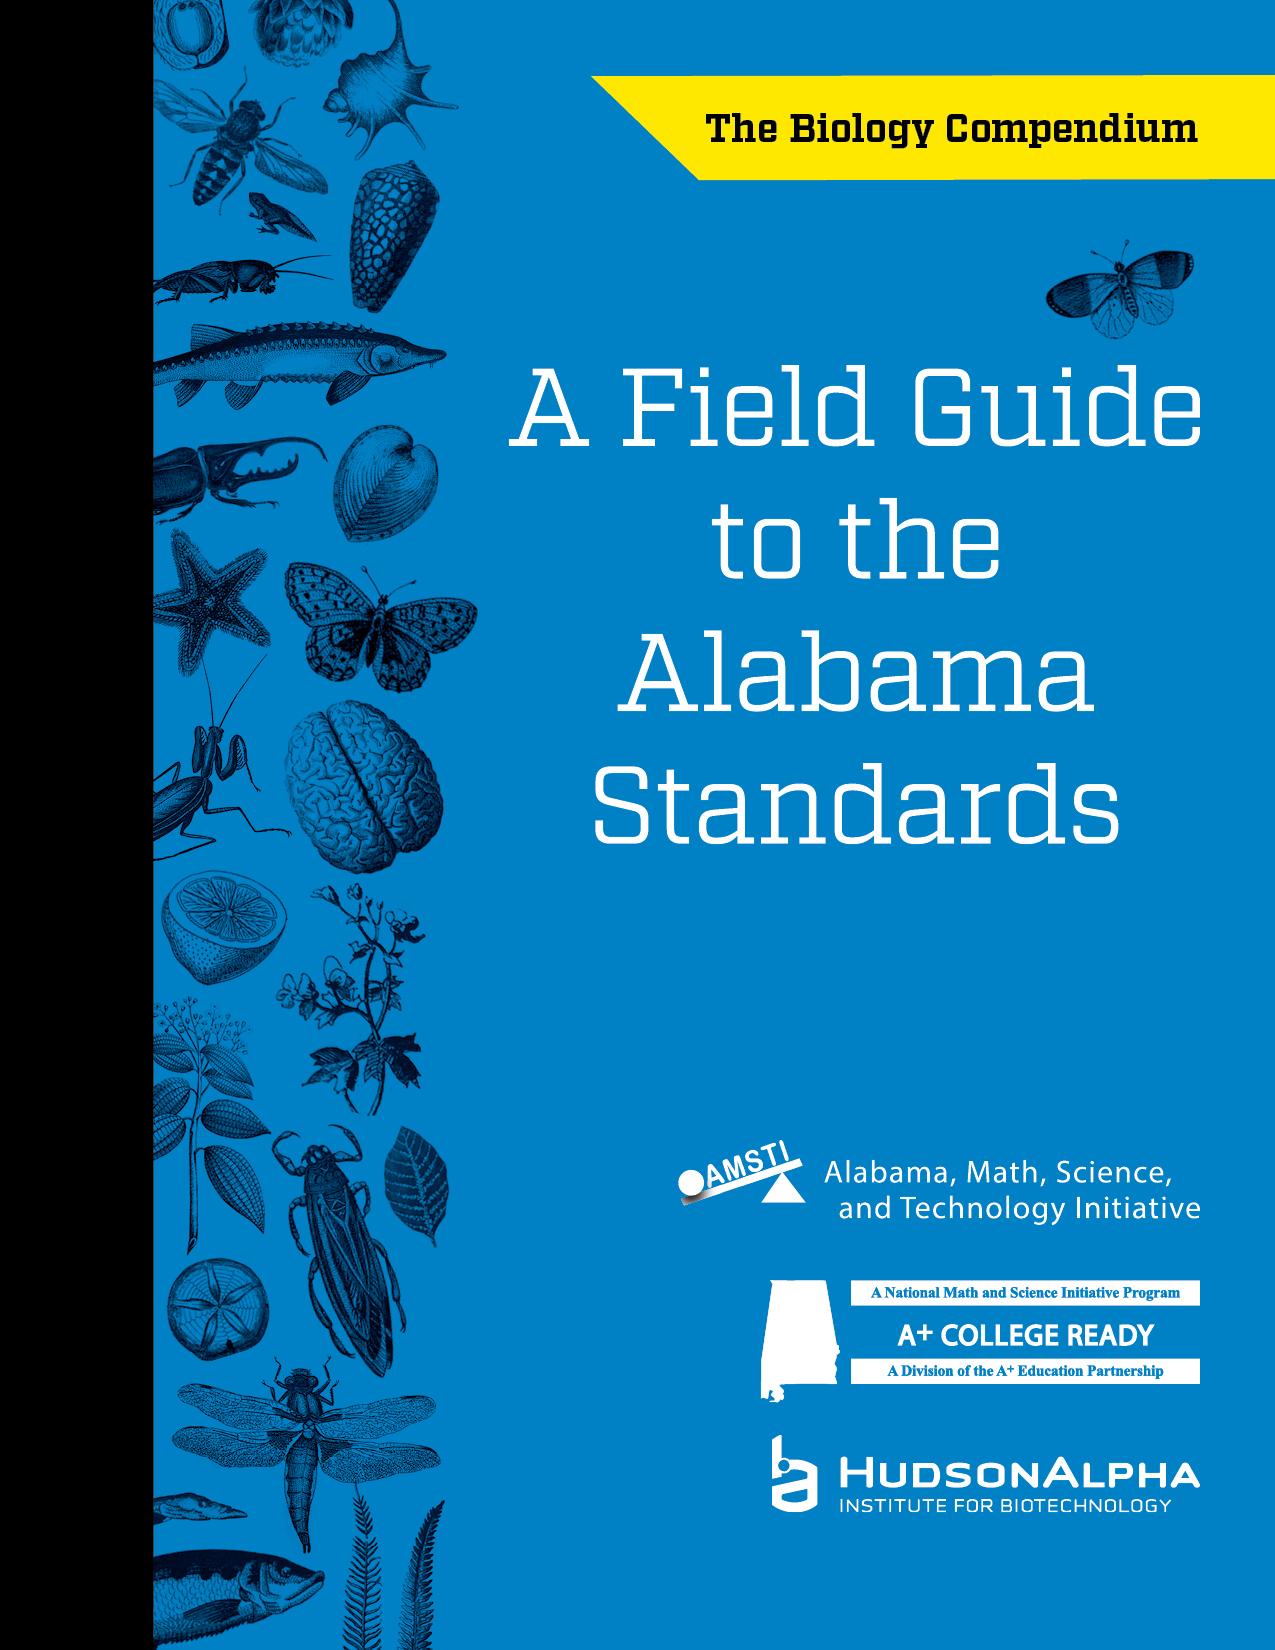 Compendium Resources Hudsonalpha Institute For Biotechnology